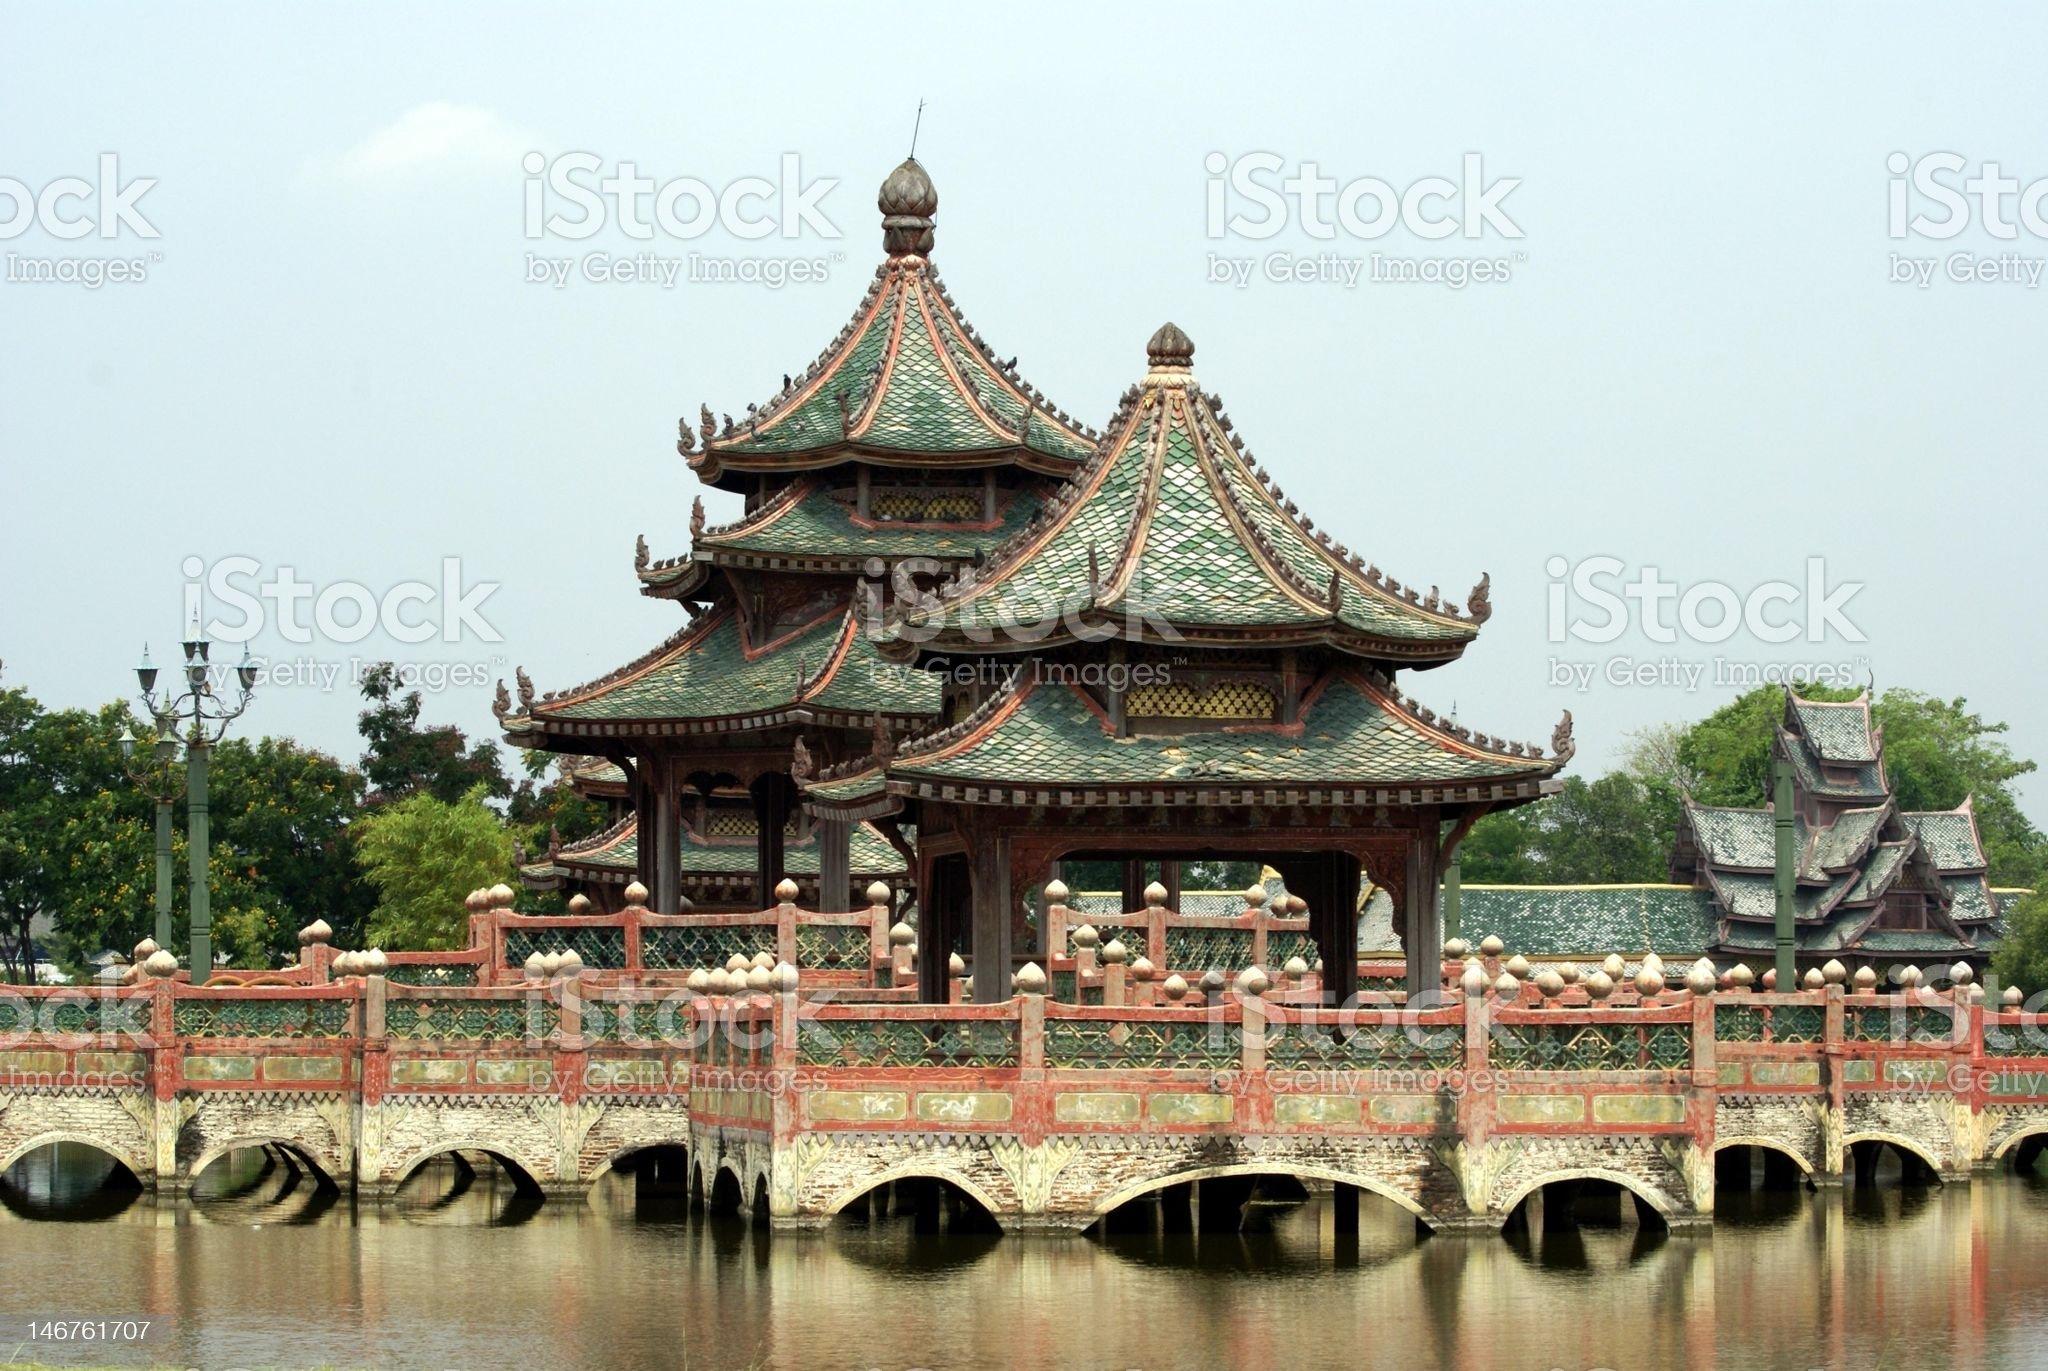 Pagoda on bridge over lake royalty-free stock photo